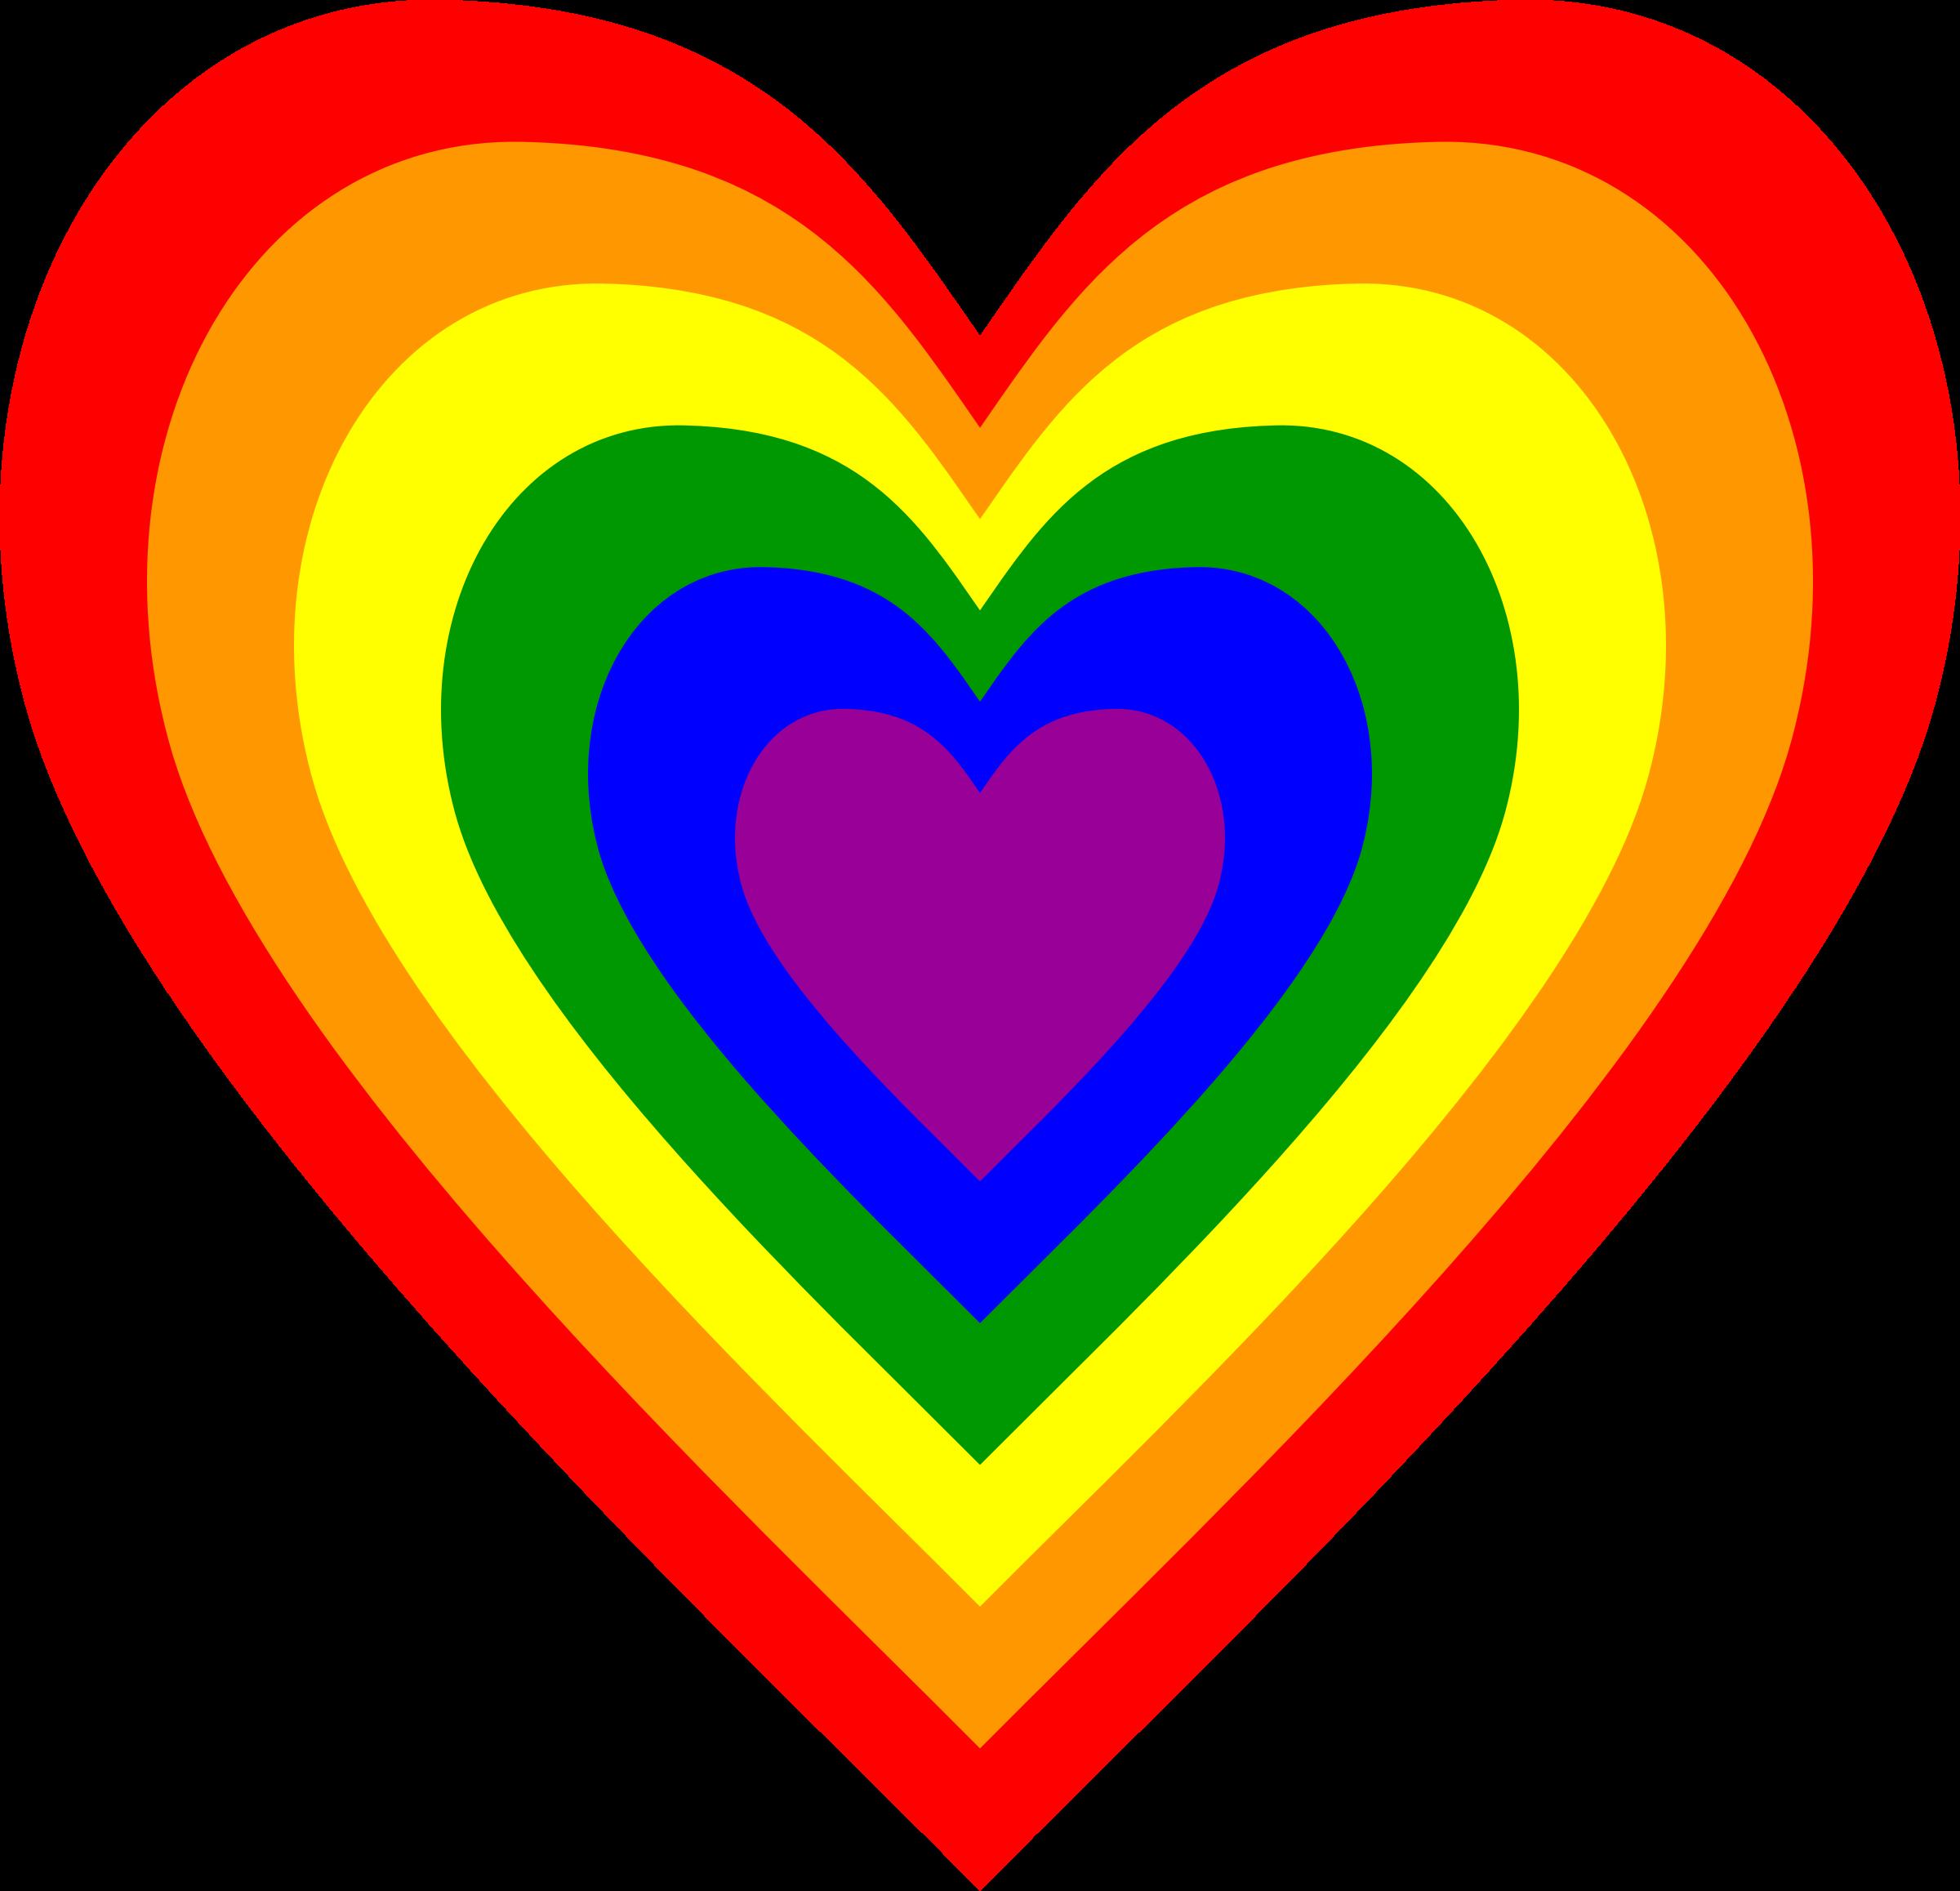 Rainbow Heart Gem Heart Sticker Zazzle Com Rainbow Heart Heart Stickers Blue Butterfly Wallpaper